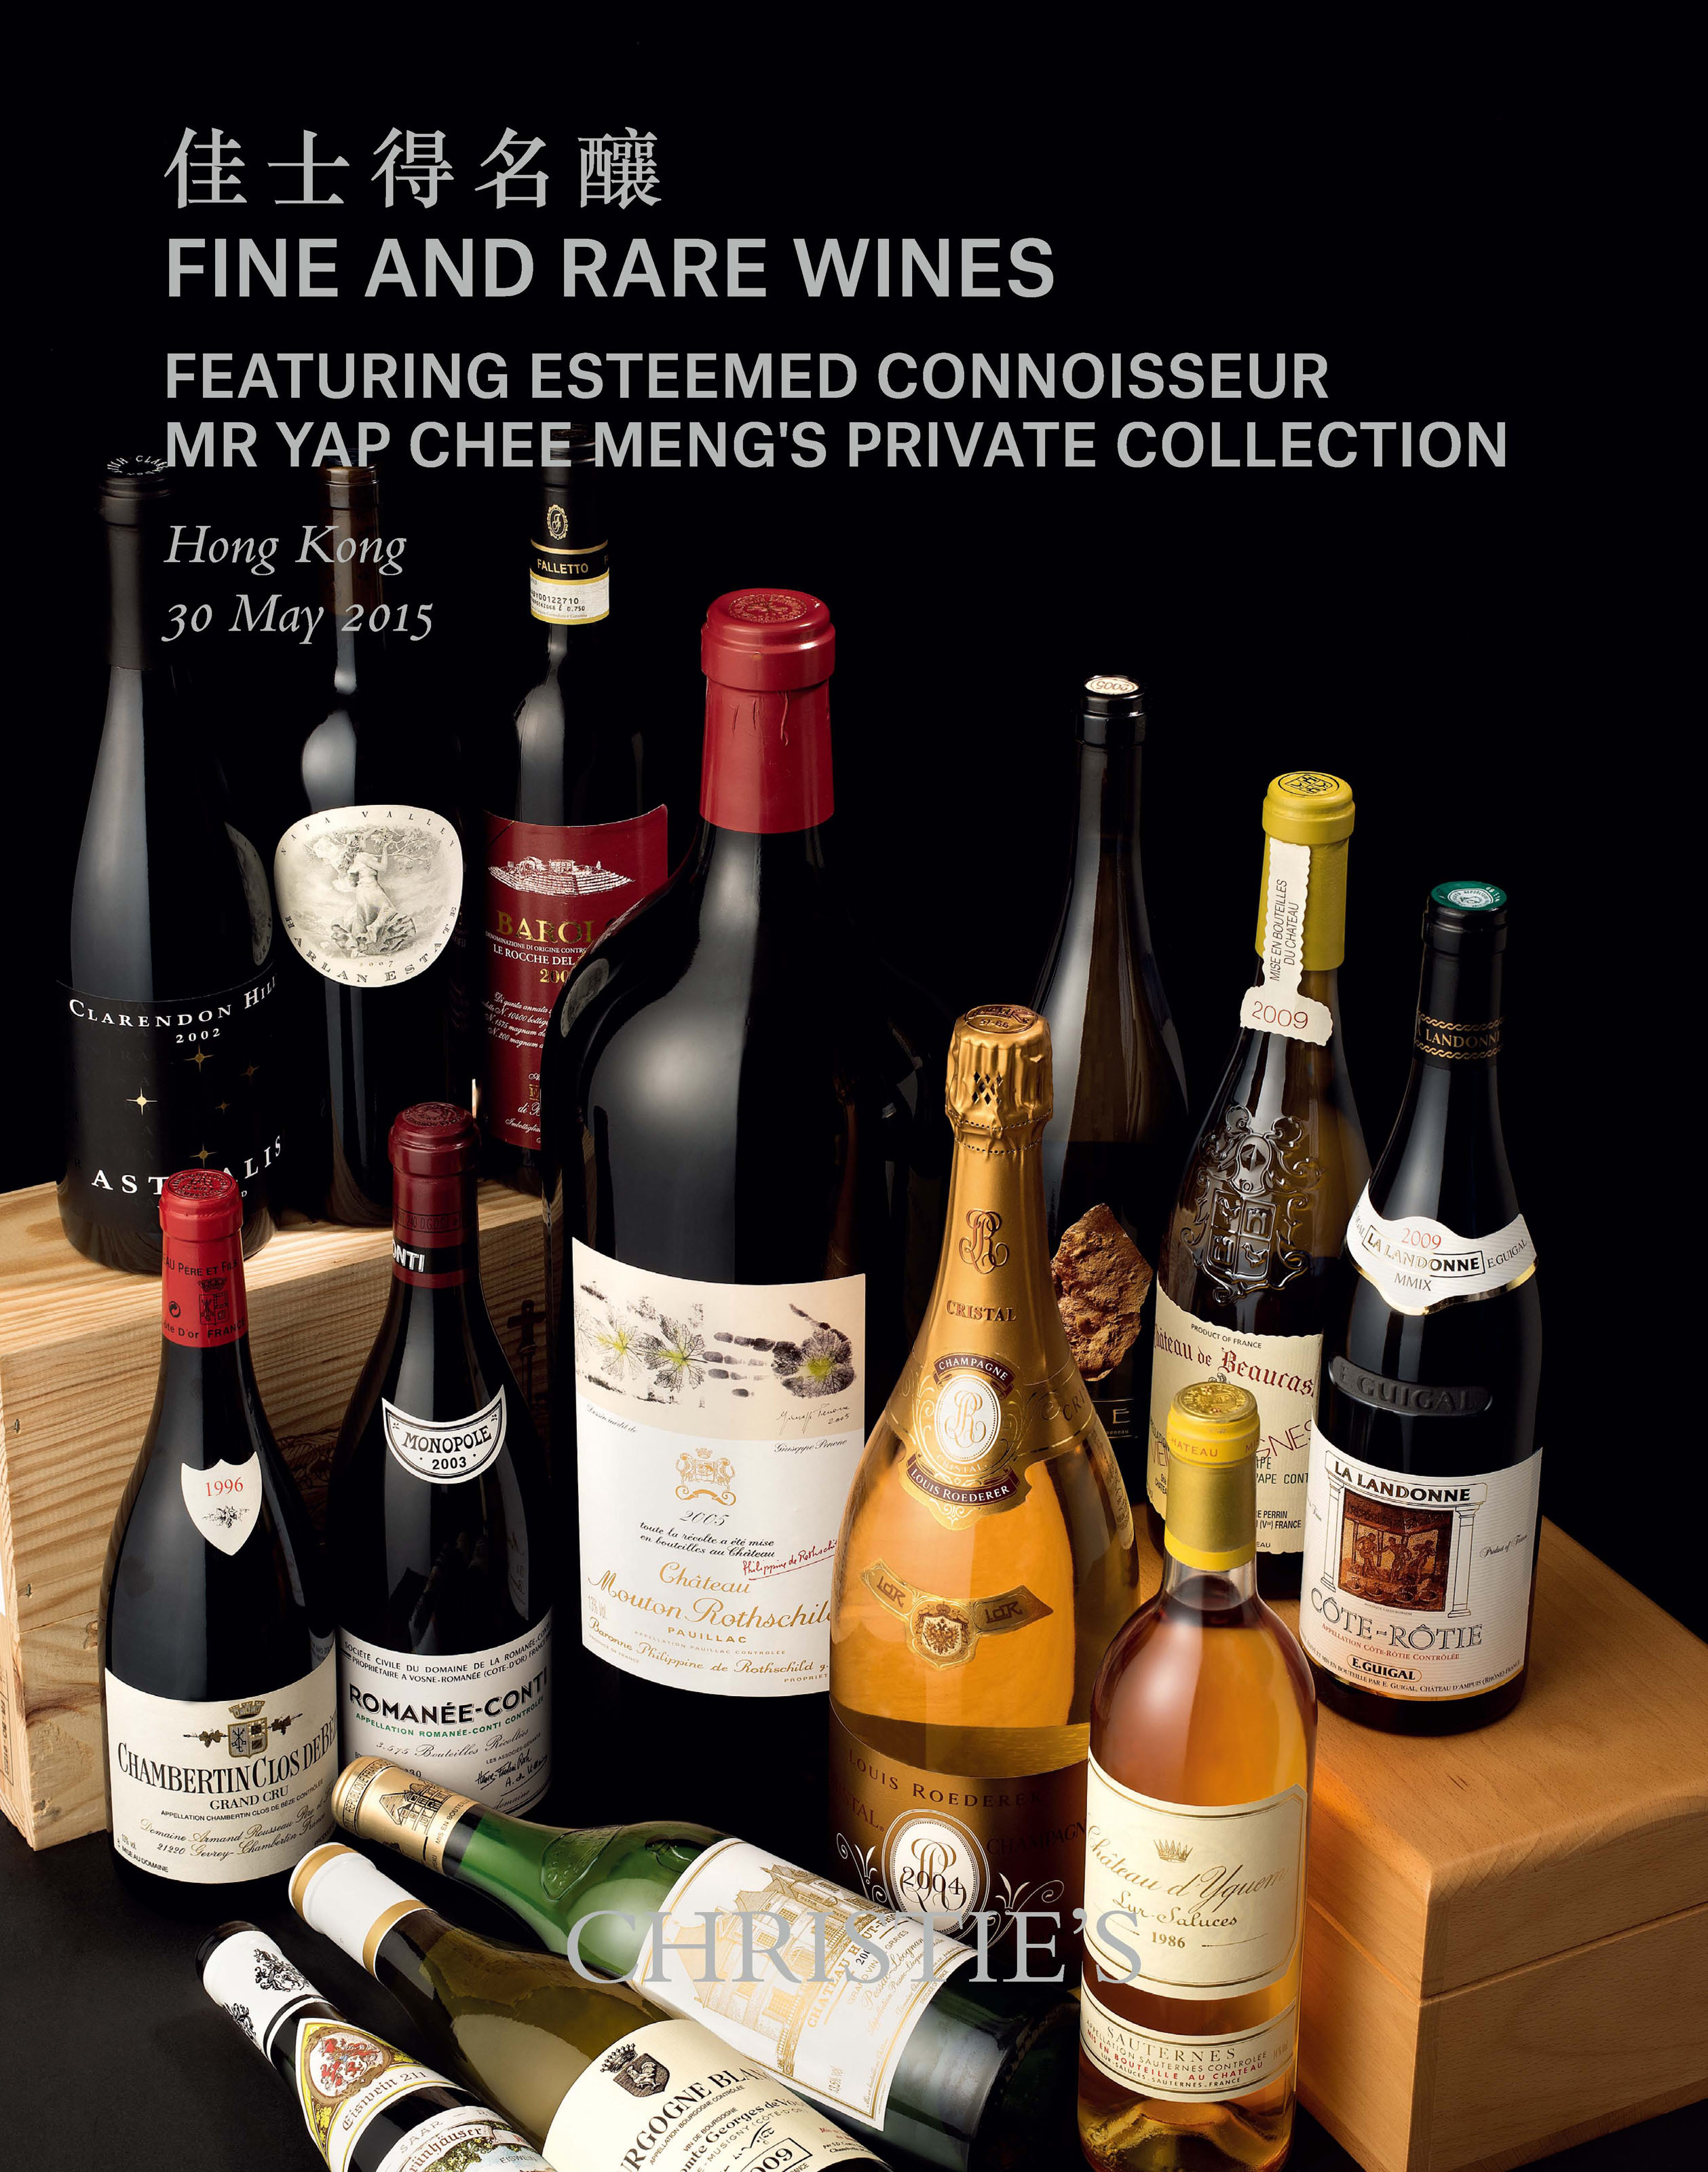 Marcassin, Chardonnay 2005